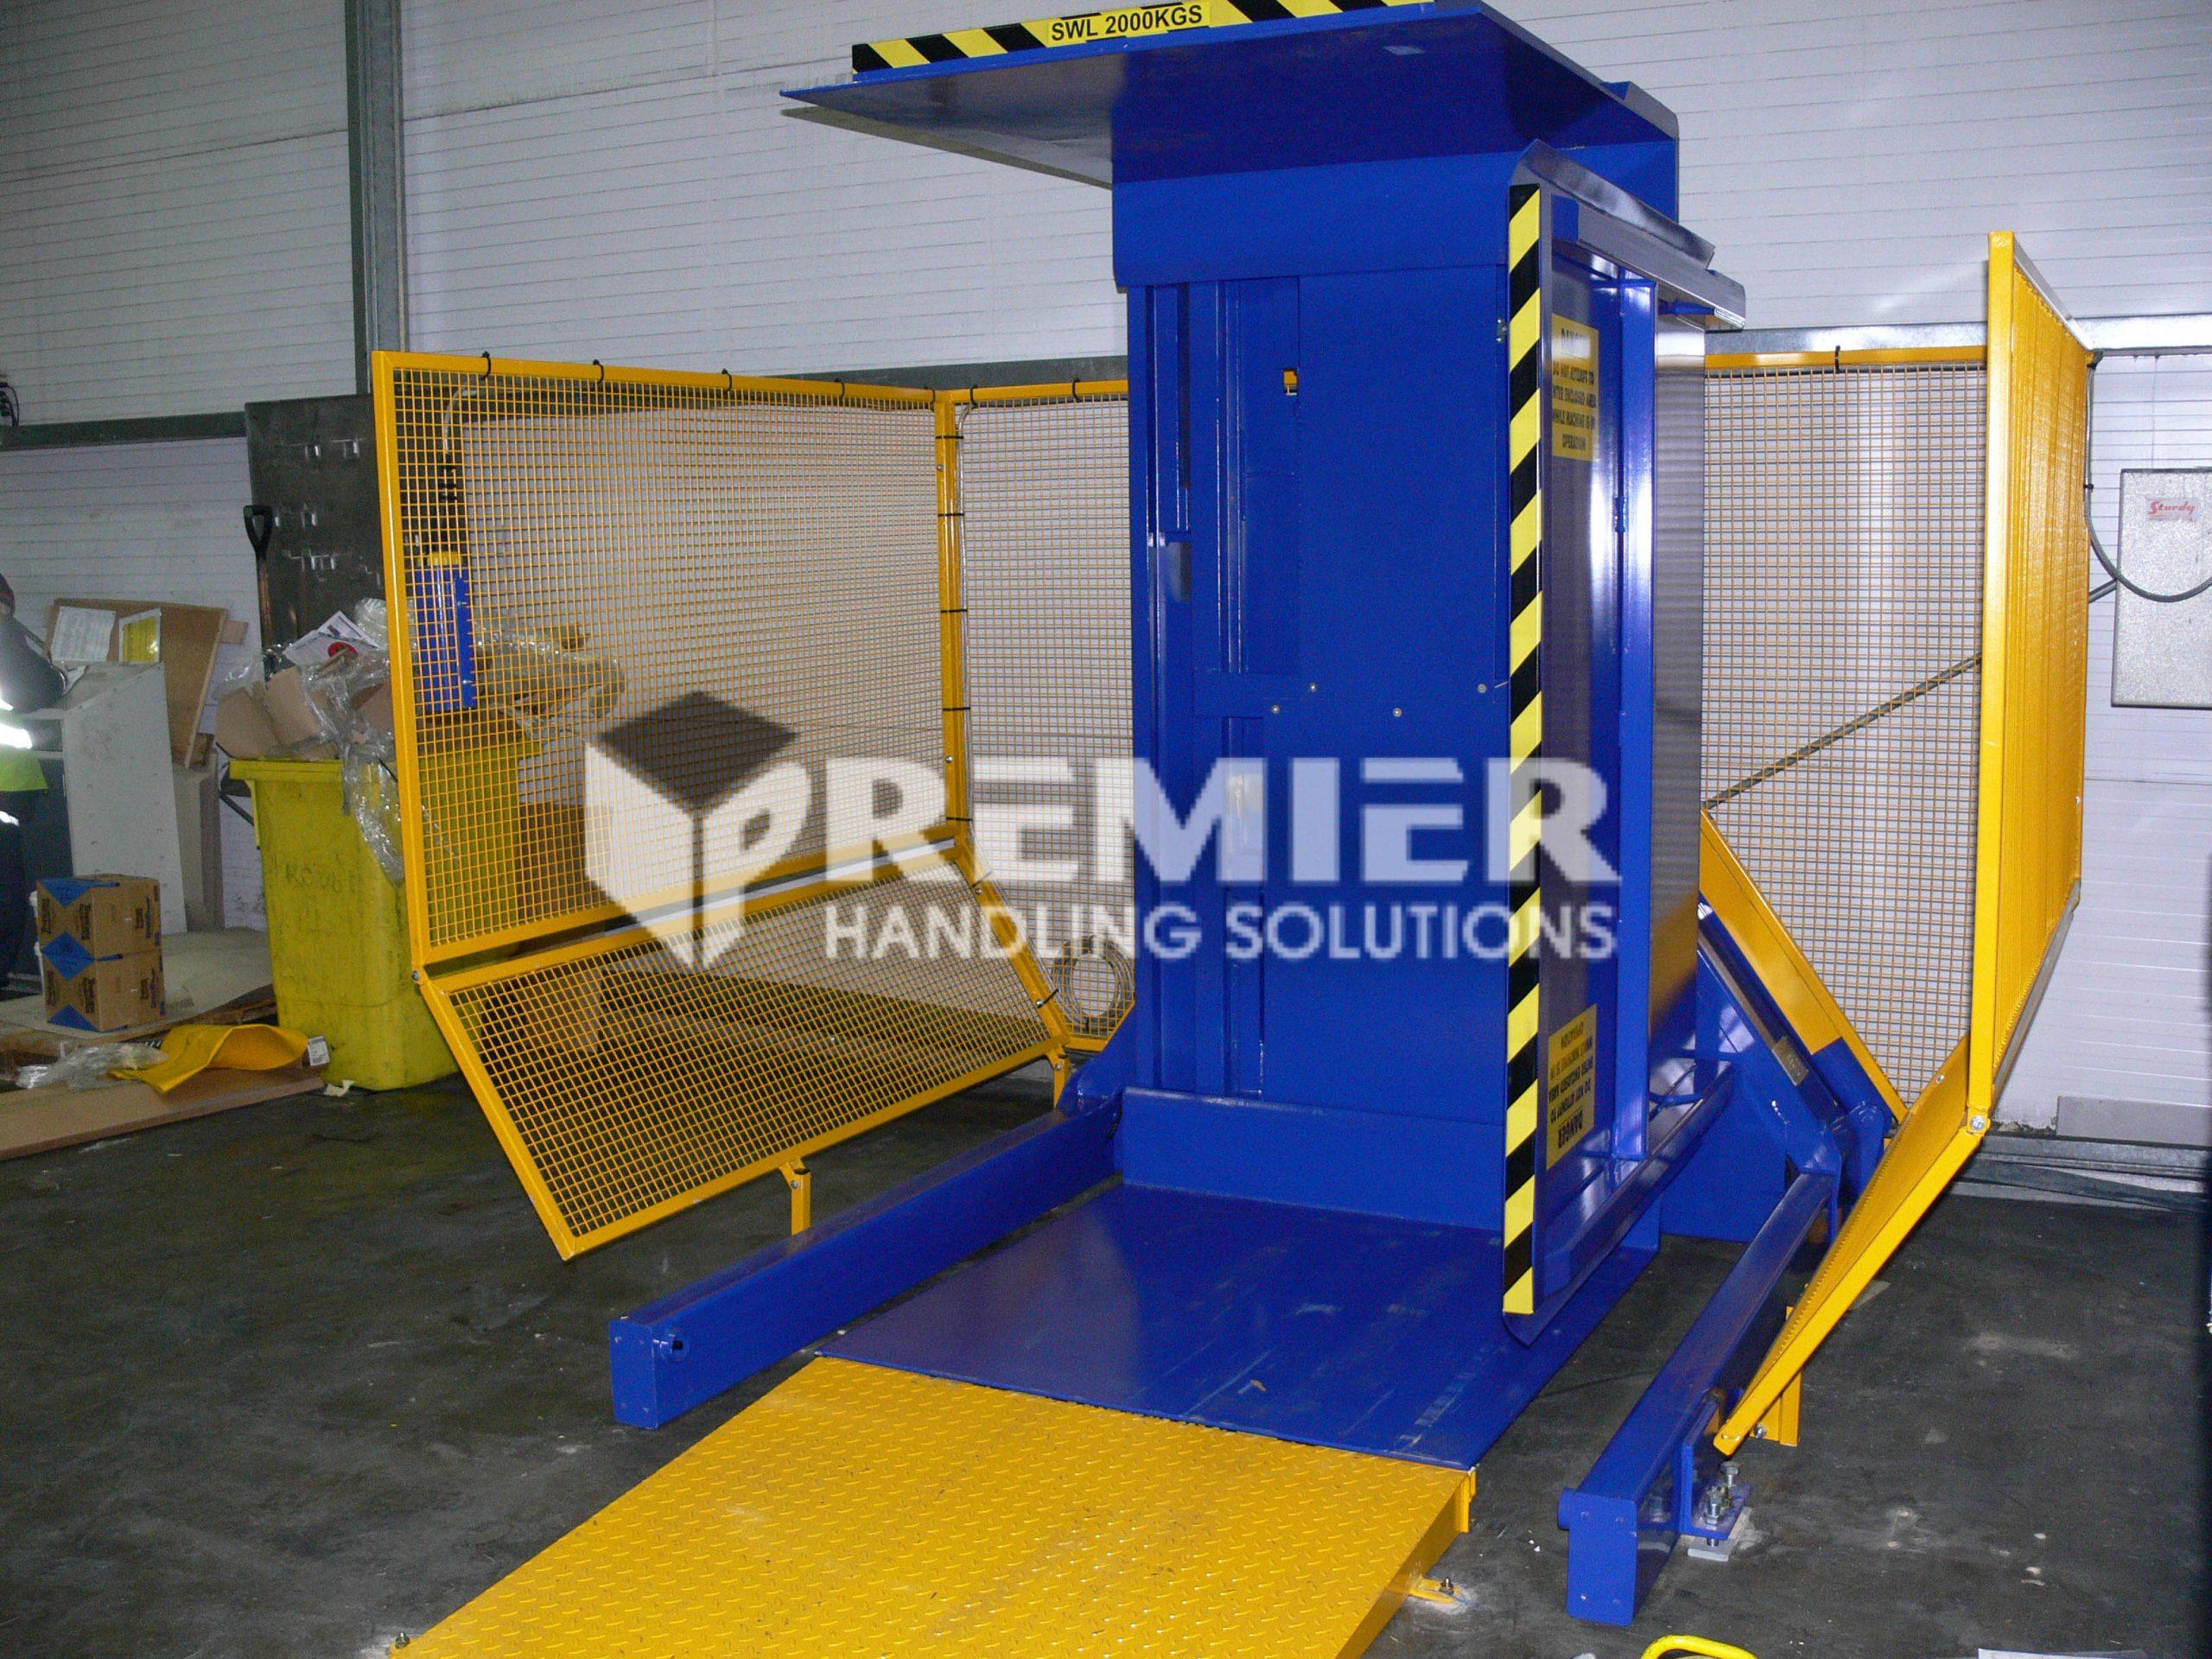 Fsdc Pallet Inverter Gallery 32